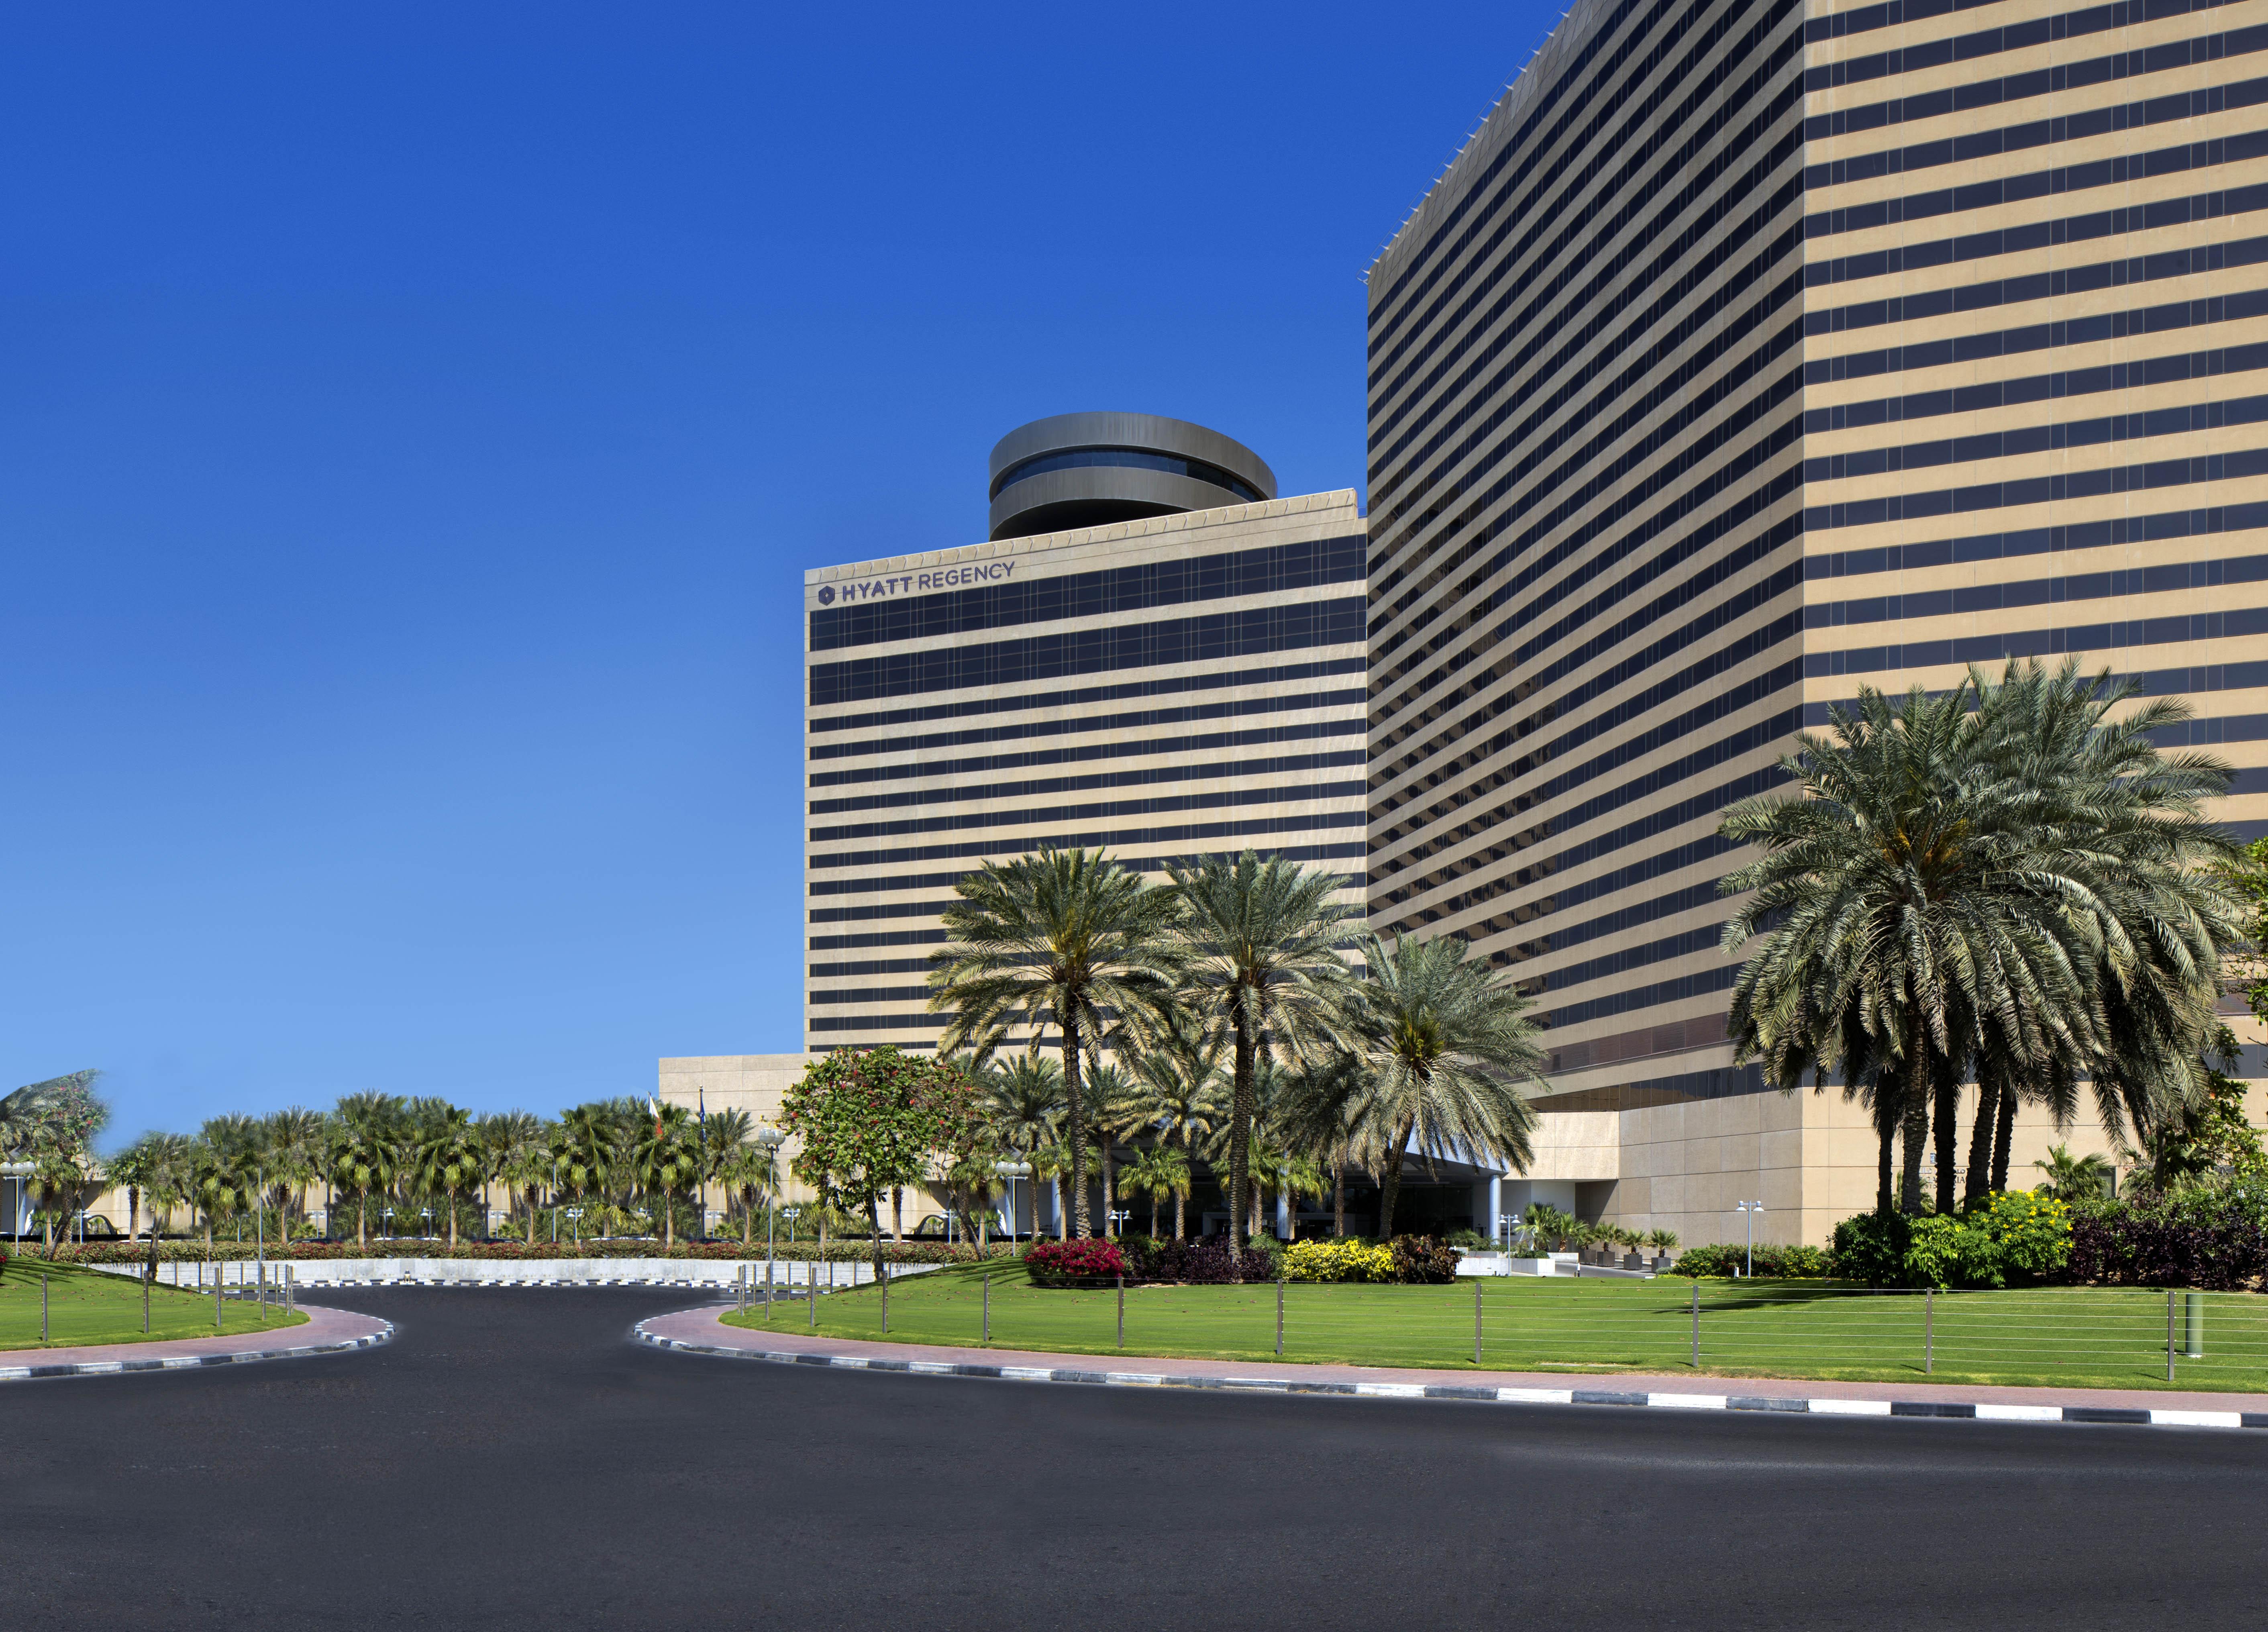 Hyatt Regency Dubai - Wikipedia